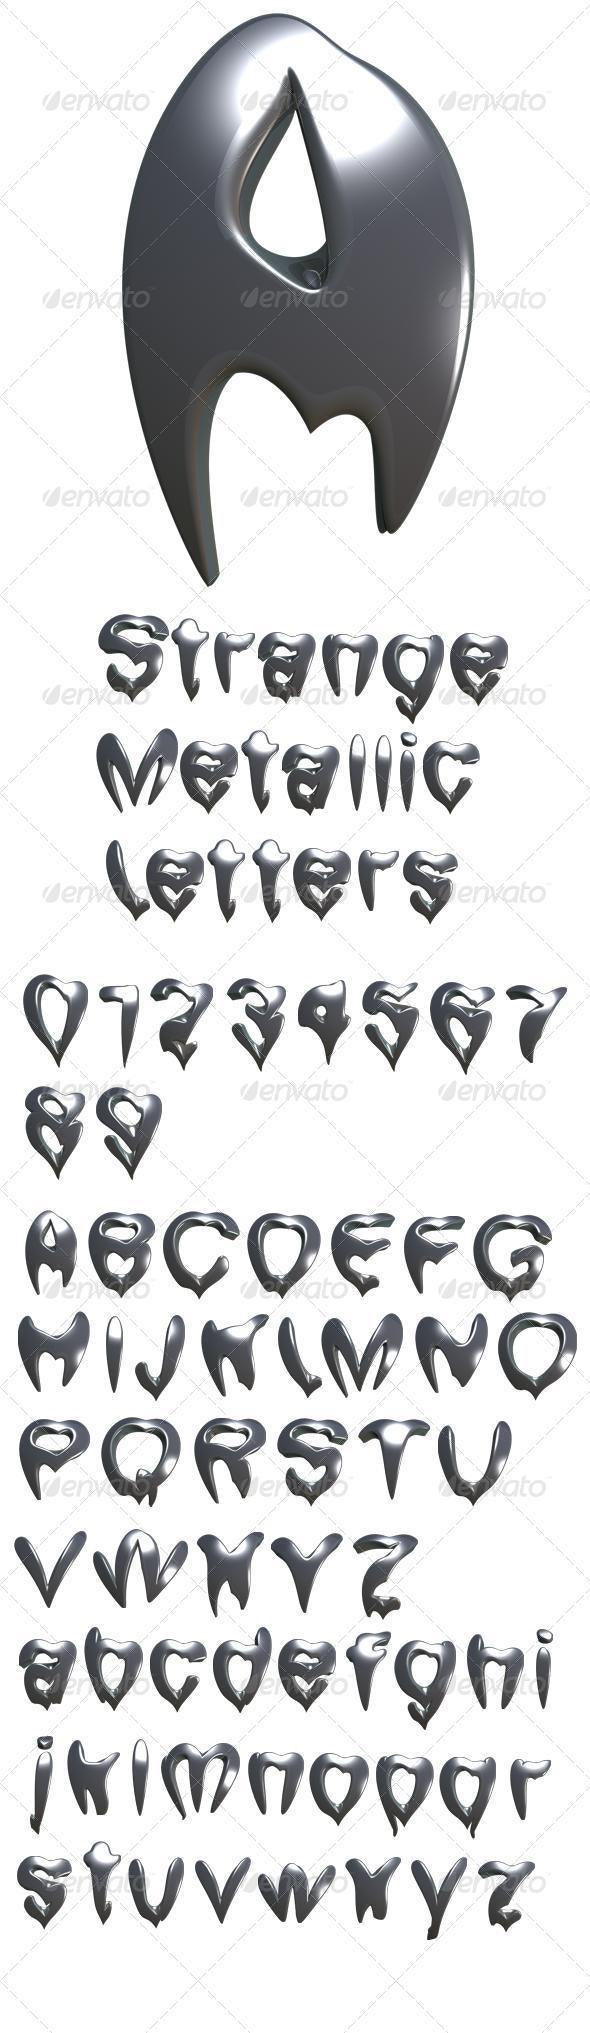 Strange Metallic Letters - Text 3D Renders